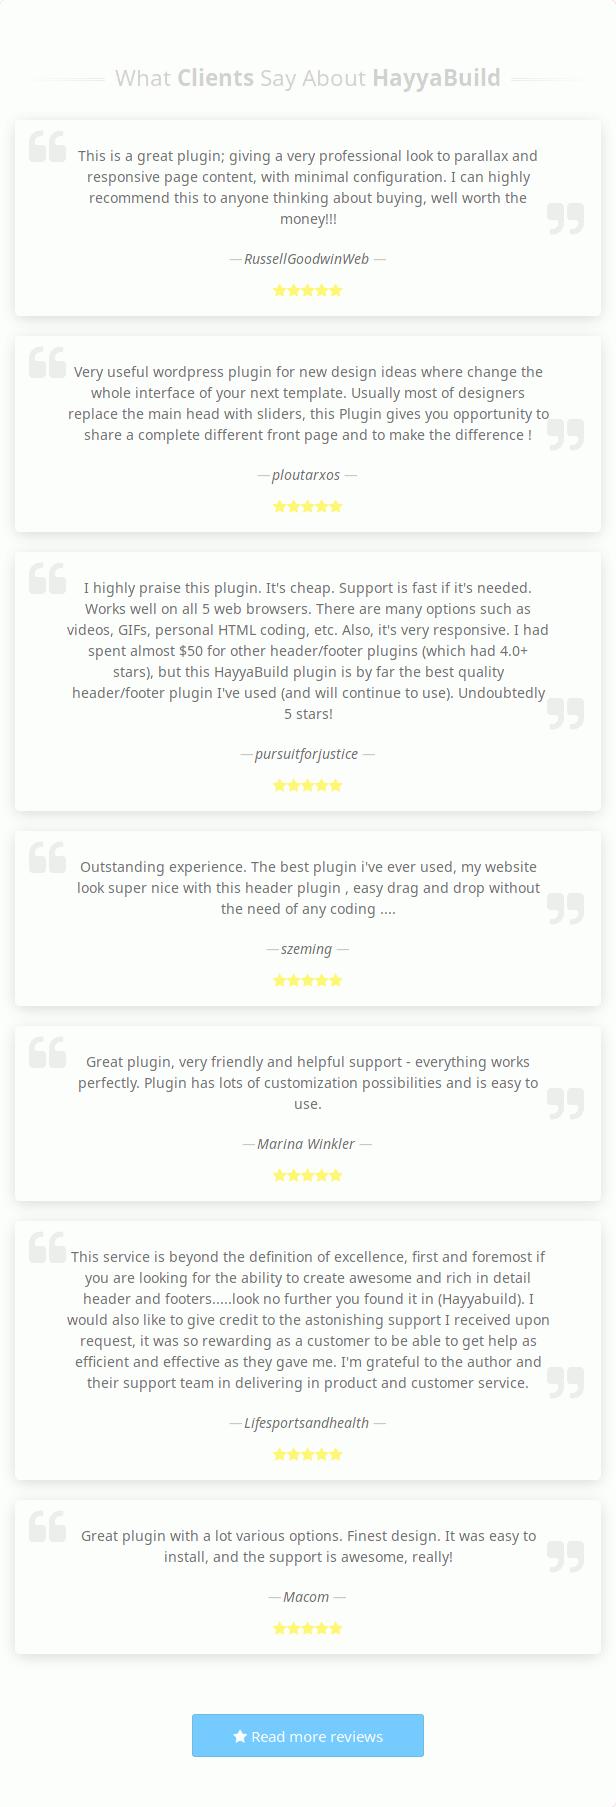 HayyaBuild reviews